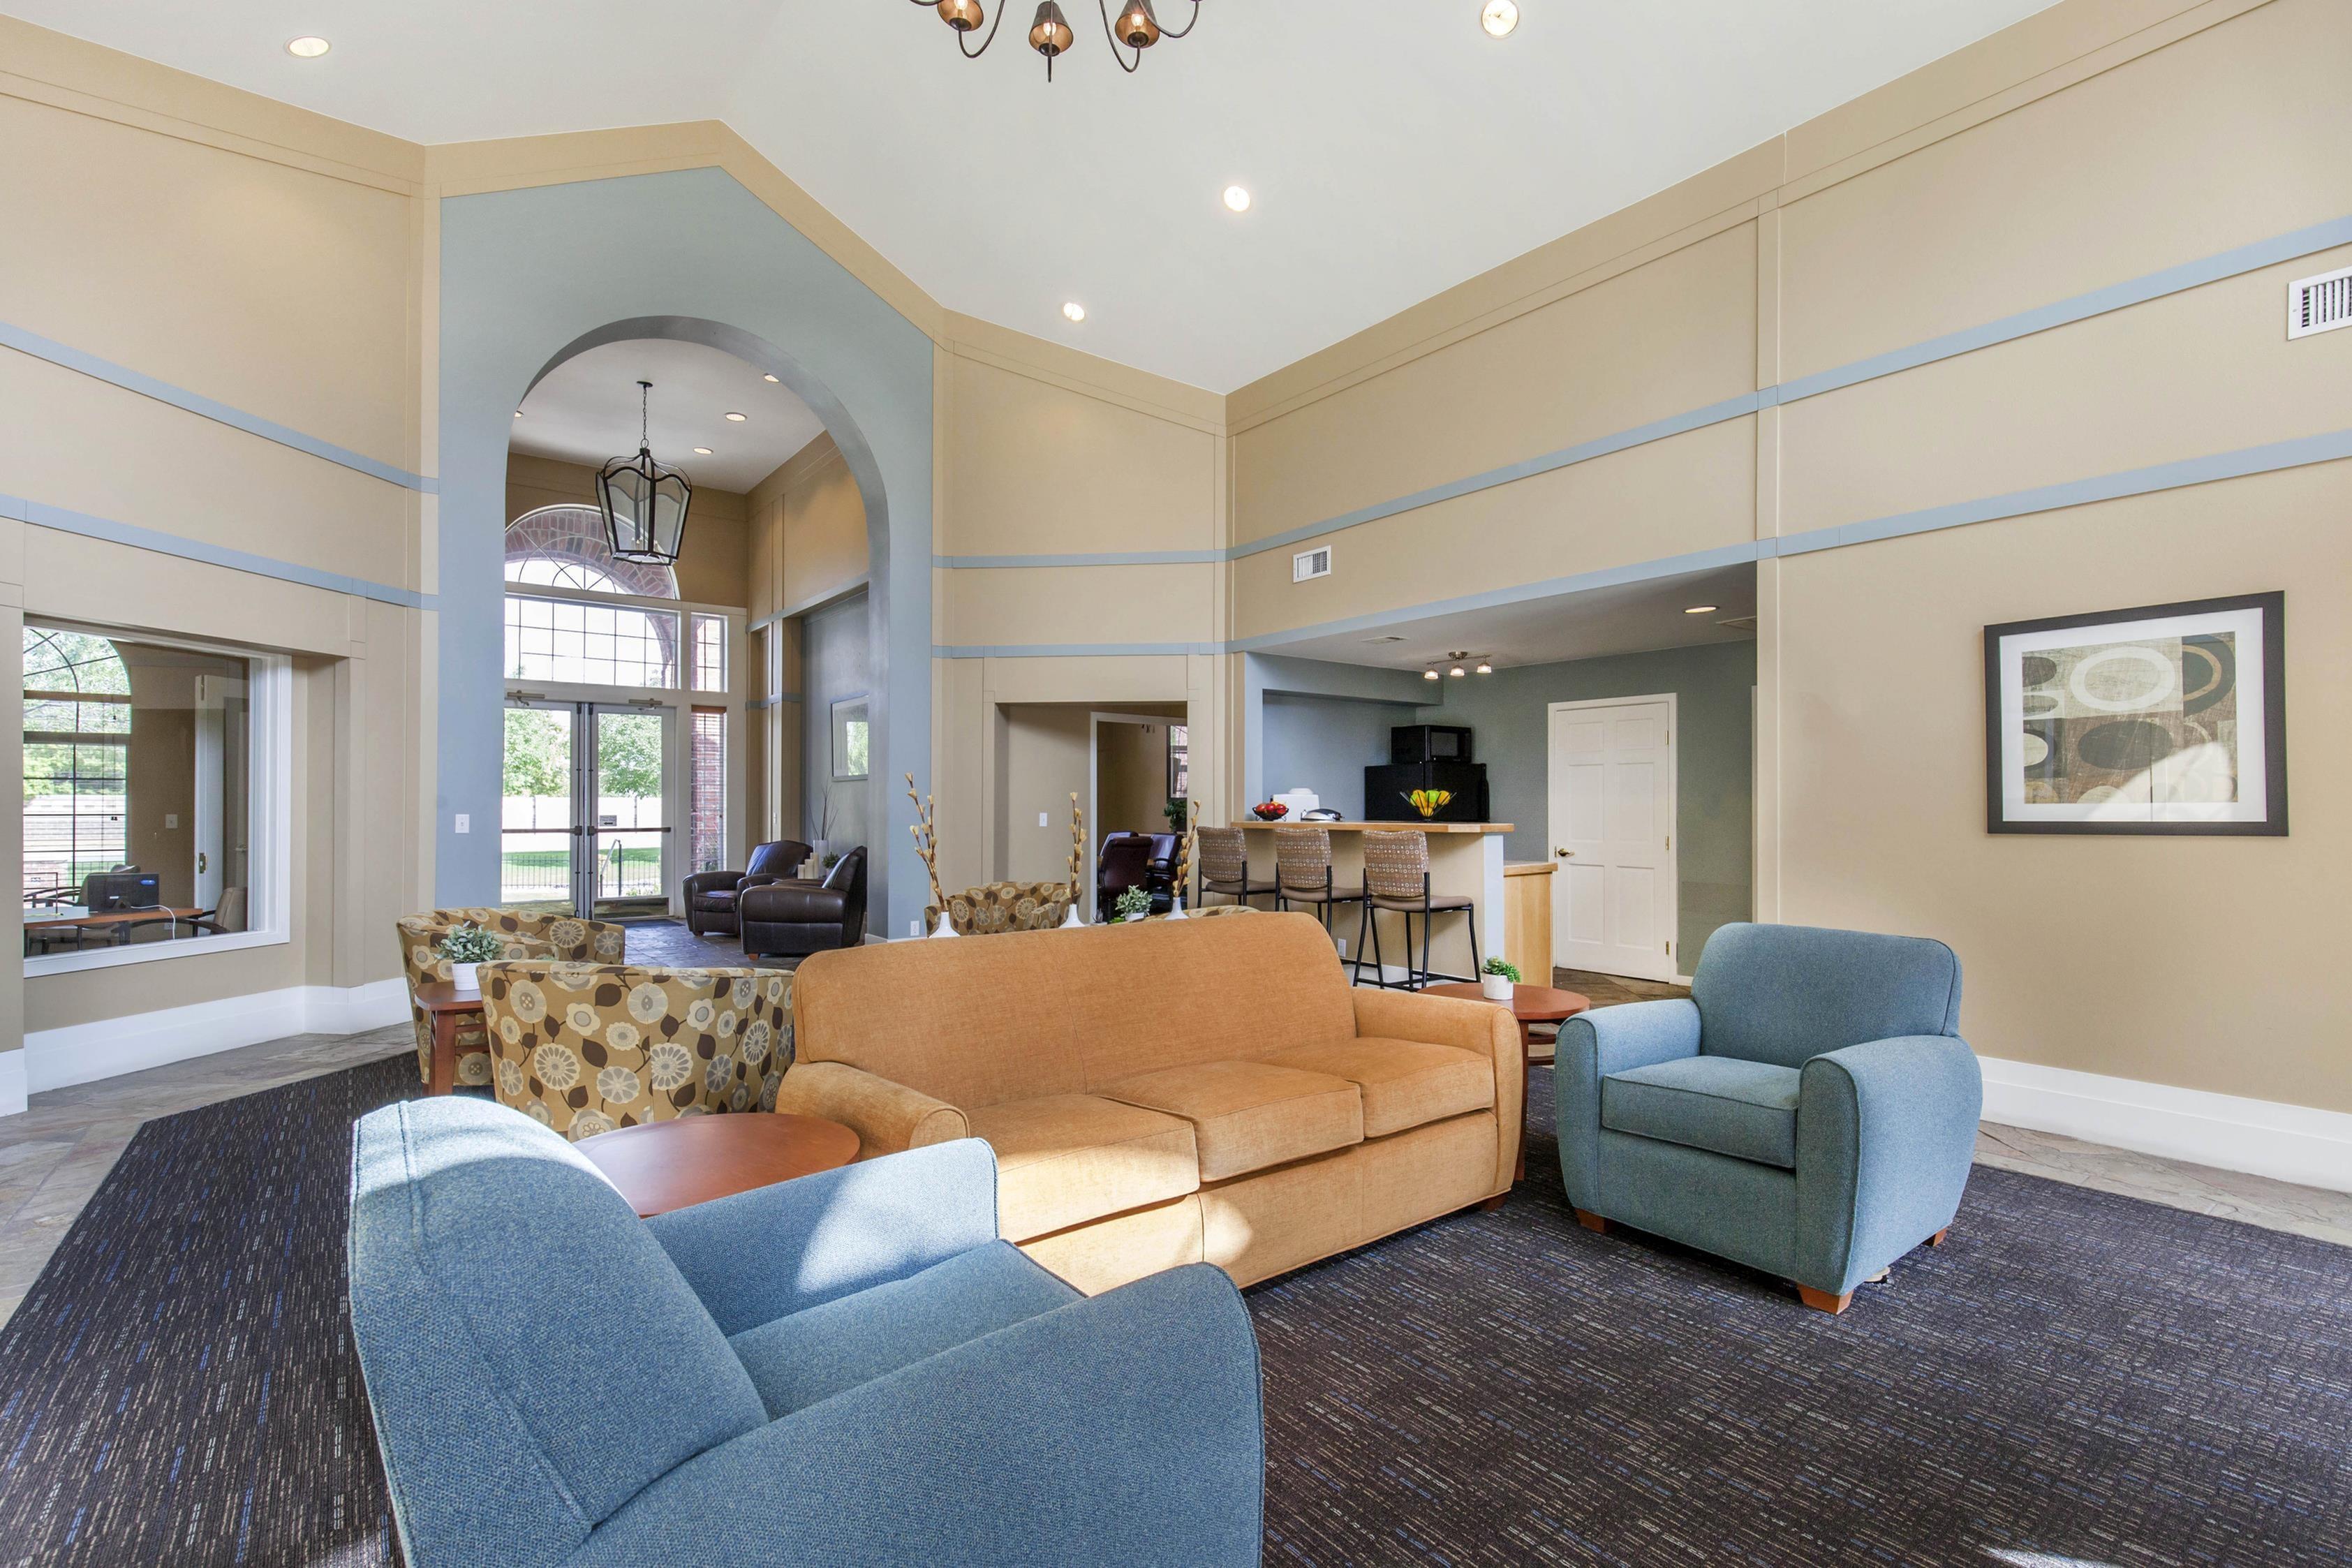 Copper Canyon Apartment Homes JIU | College Student Apartments